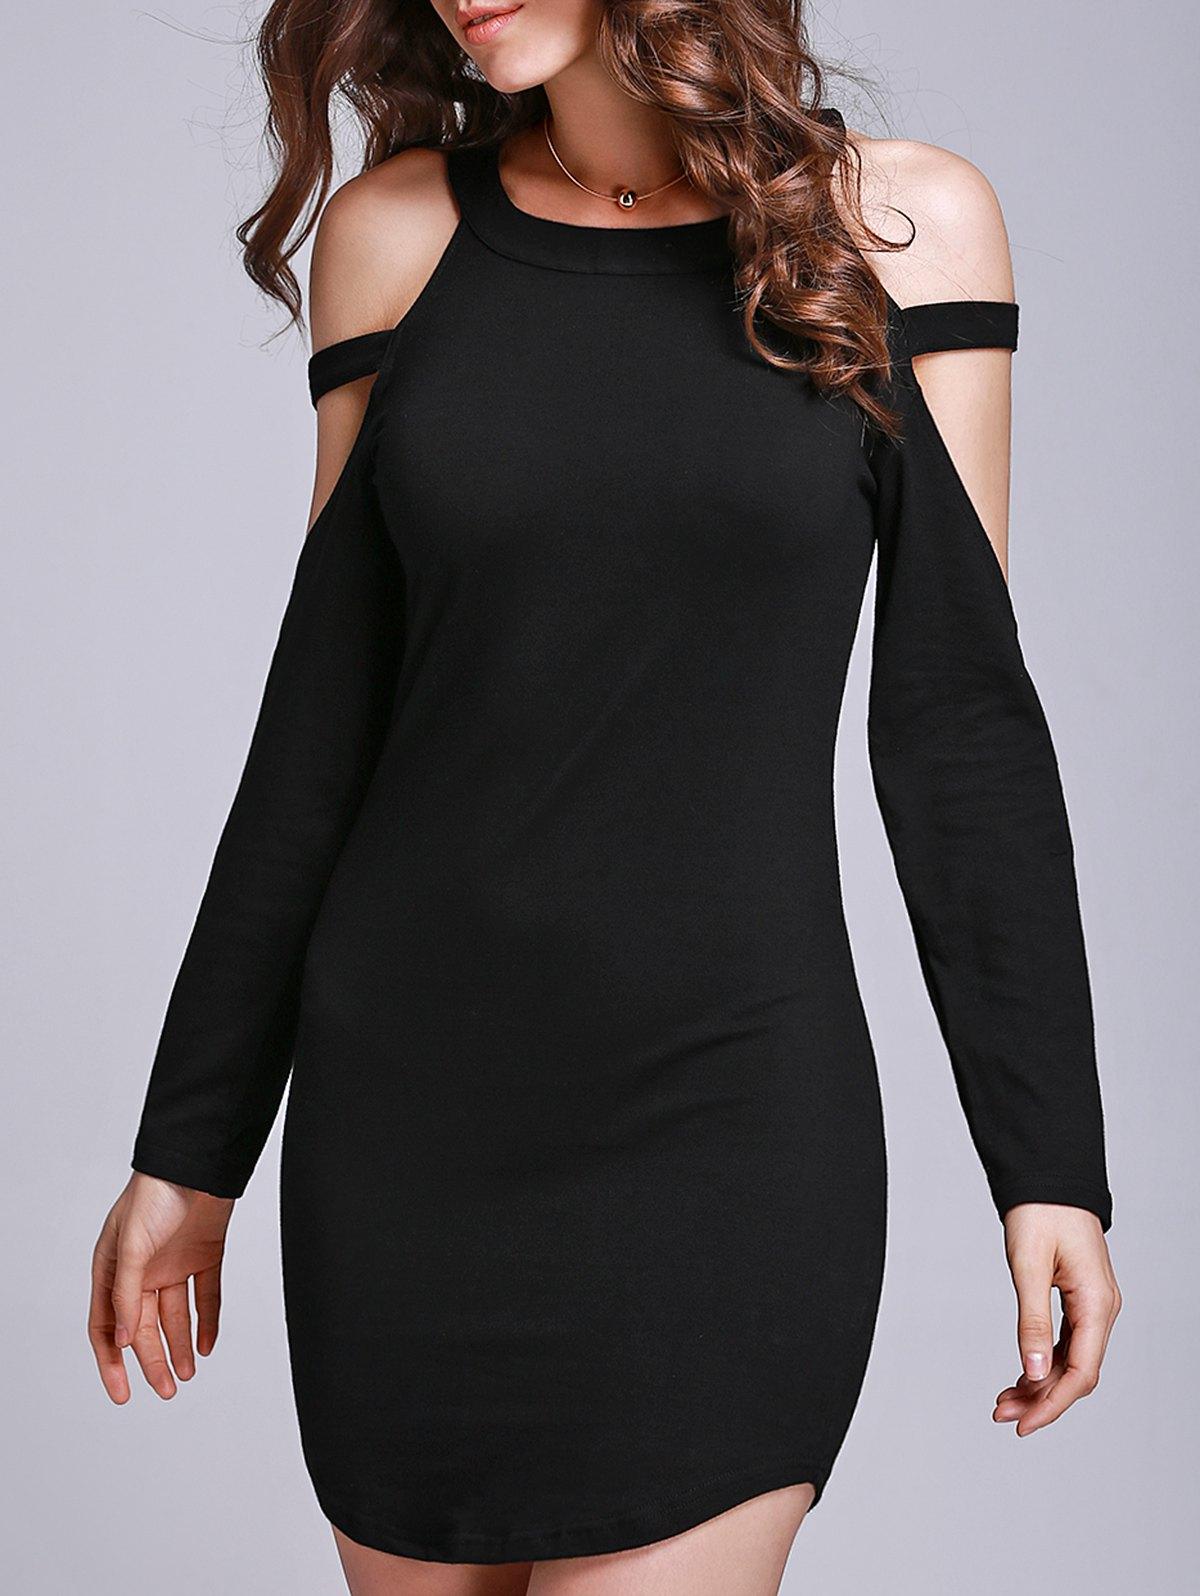 Round Collar Long Sleeve Black Hollow Dress